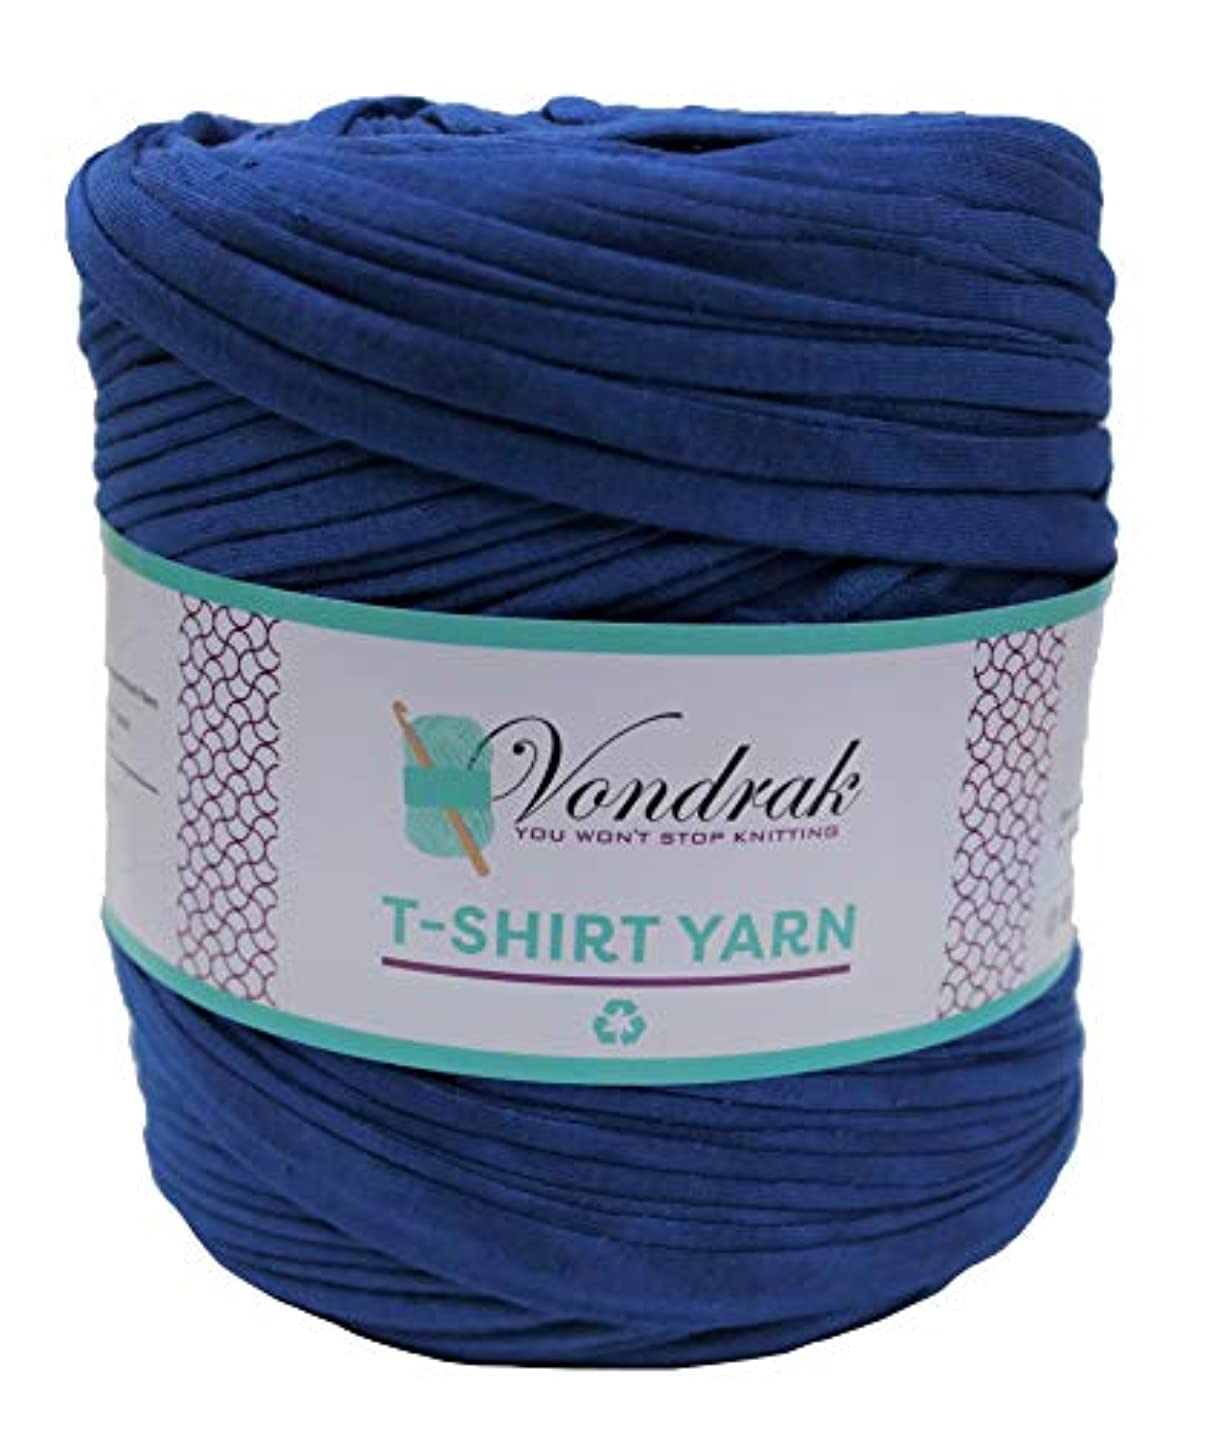 T-Shirt Yarn Recycled 130 Yards 1.5 lb Bulky Yarn│Jersey Yarn│Fabric Yarn │T Shirt Yarn for Crochet │ Knitting Tshirt Yarn │ Home Decor DYI Supply │ Recycled Yarn │Trapillo (Royal Blue)